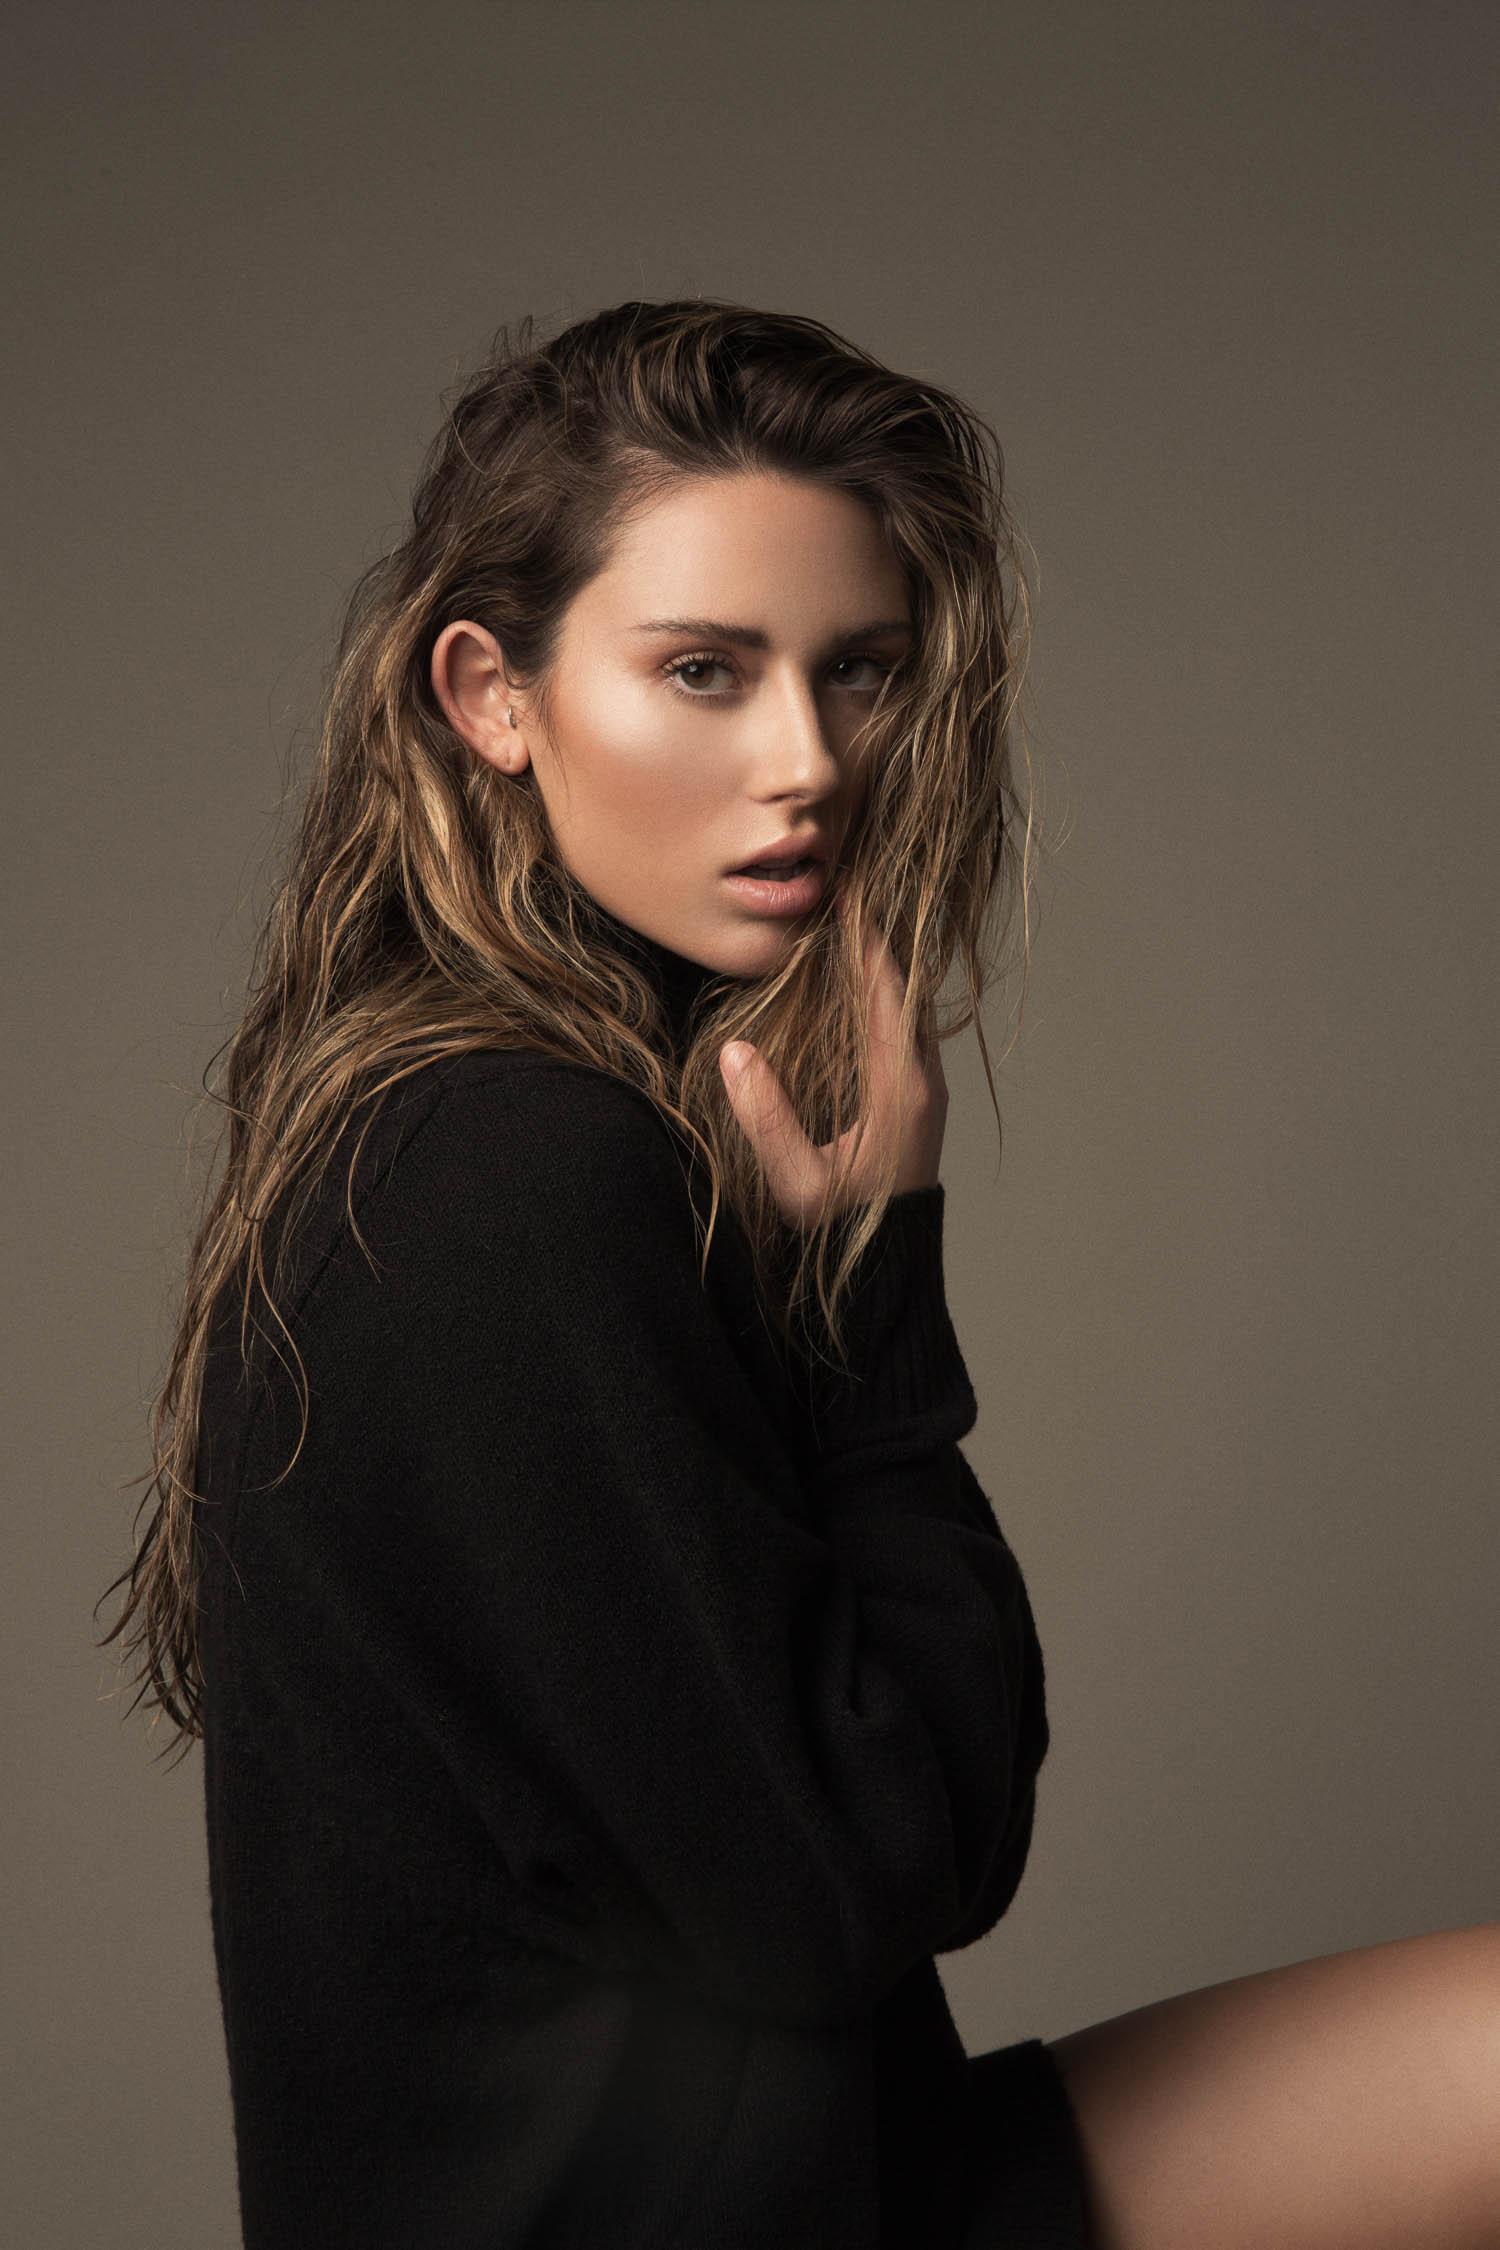 Model test wearing black turtle neck.